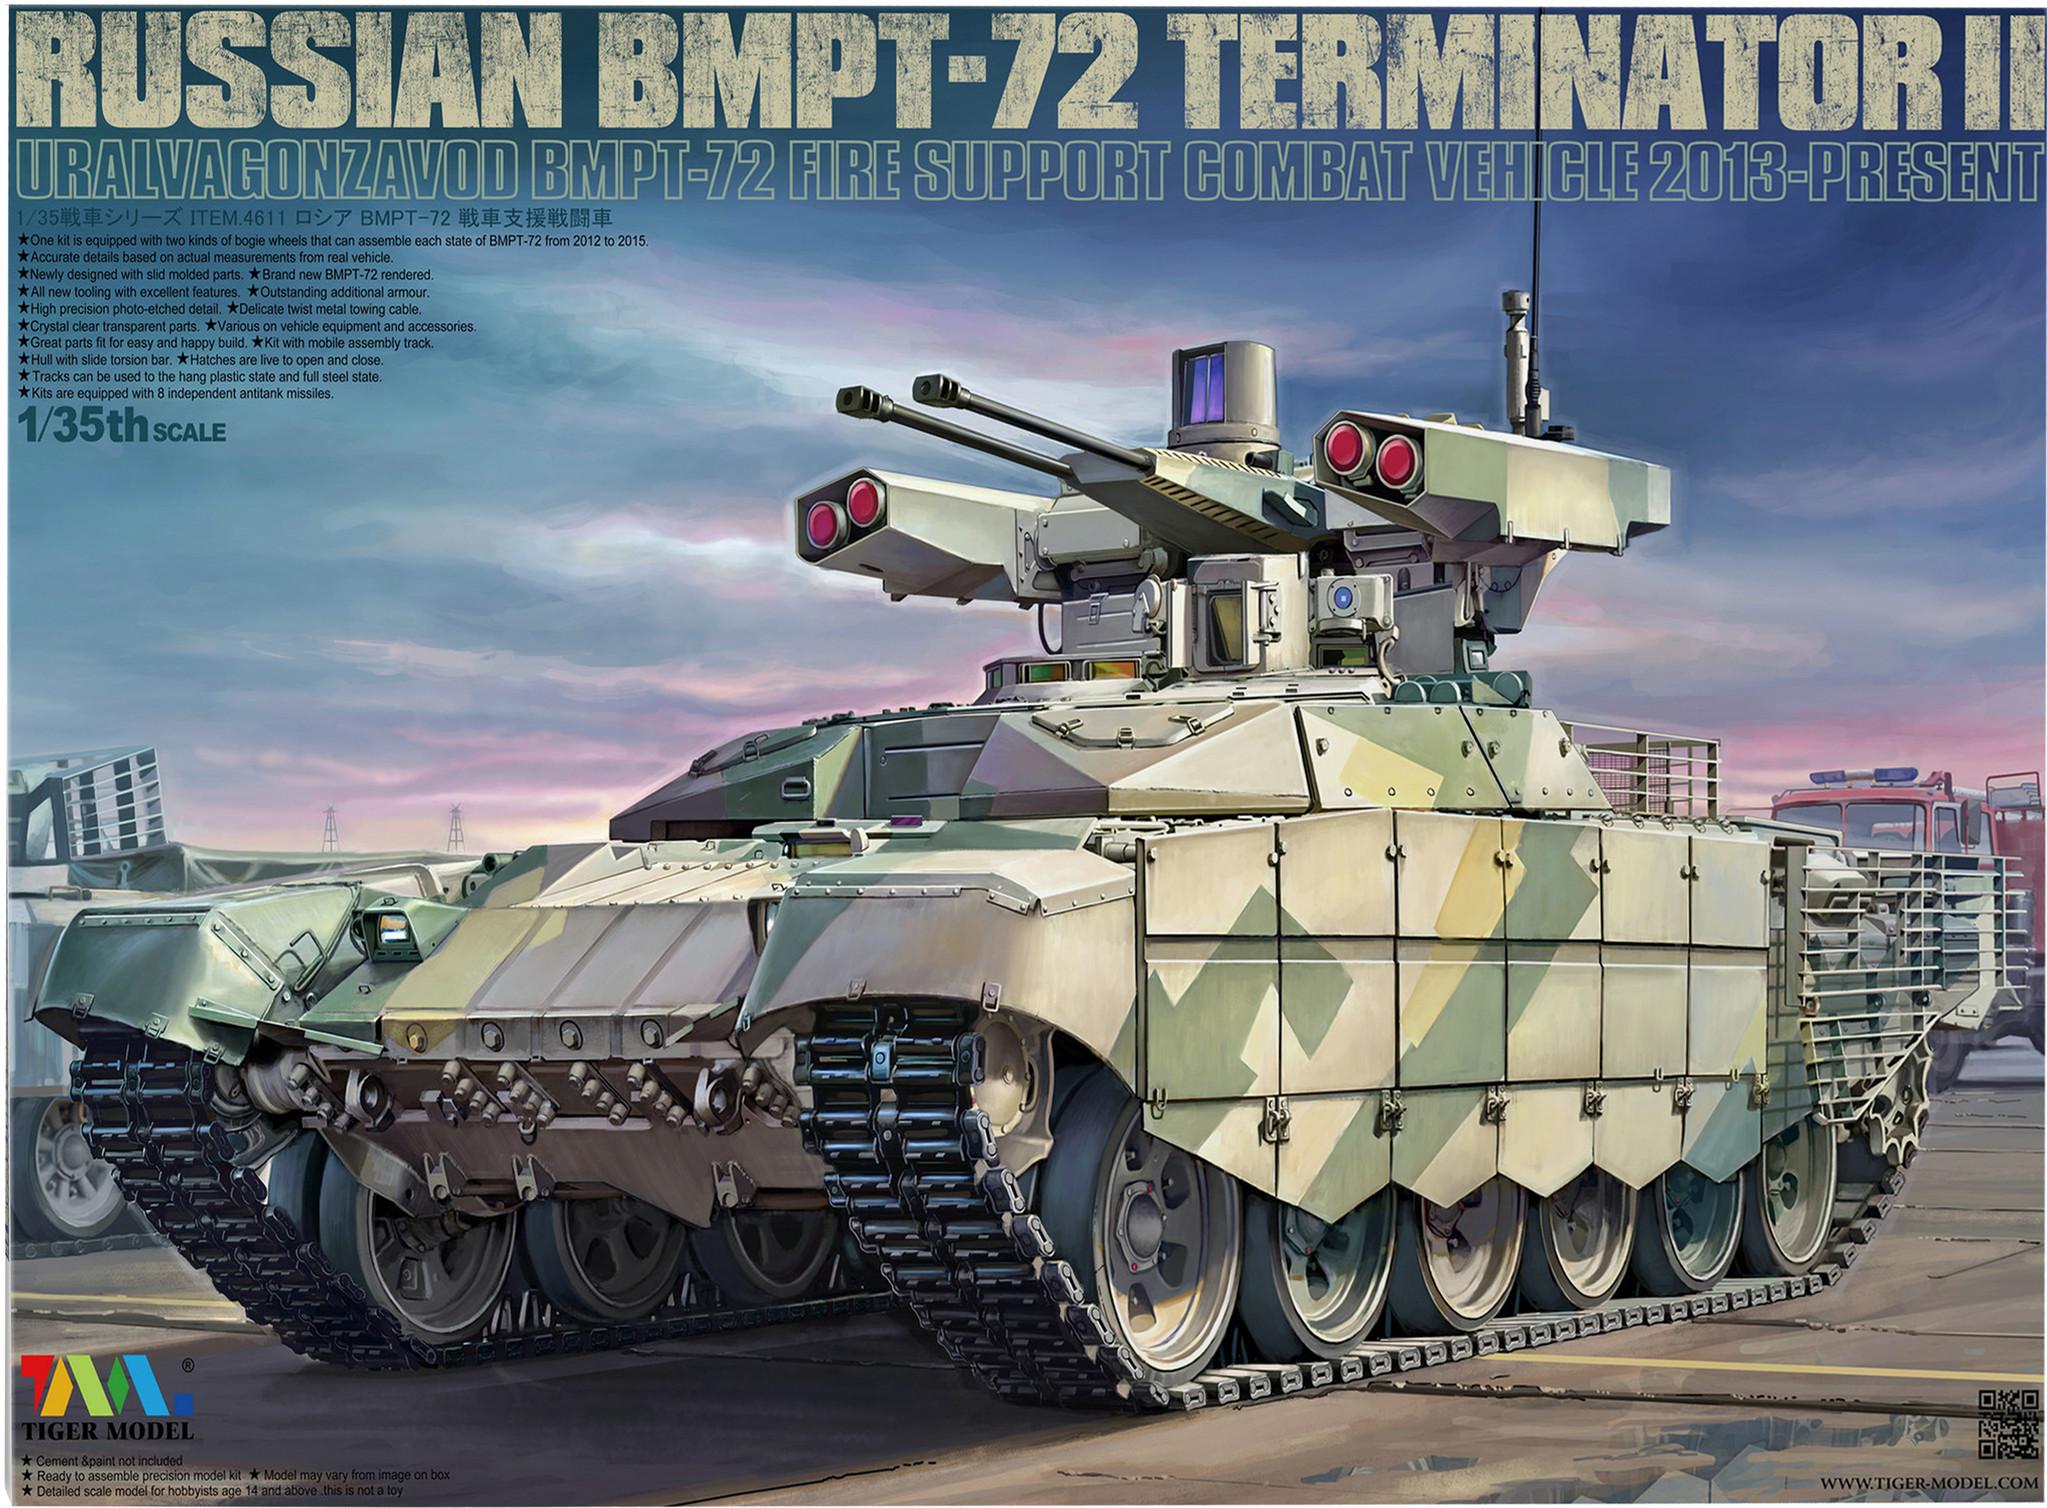 Tiger Model Bmpt-72 Terminator Ii - Tiger Model - Scale 1/35 - TIGE4611